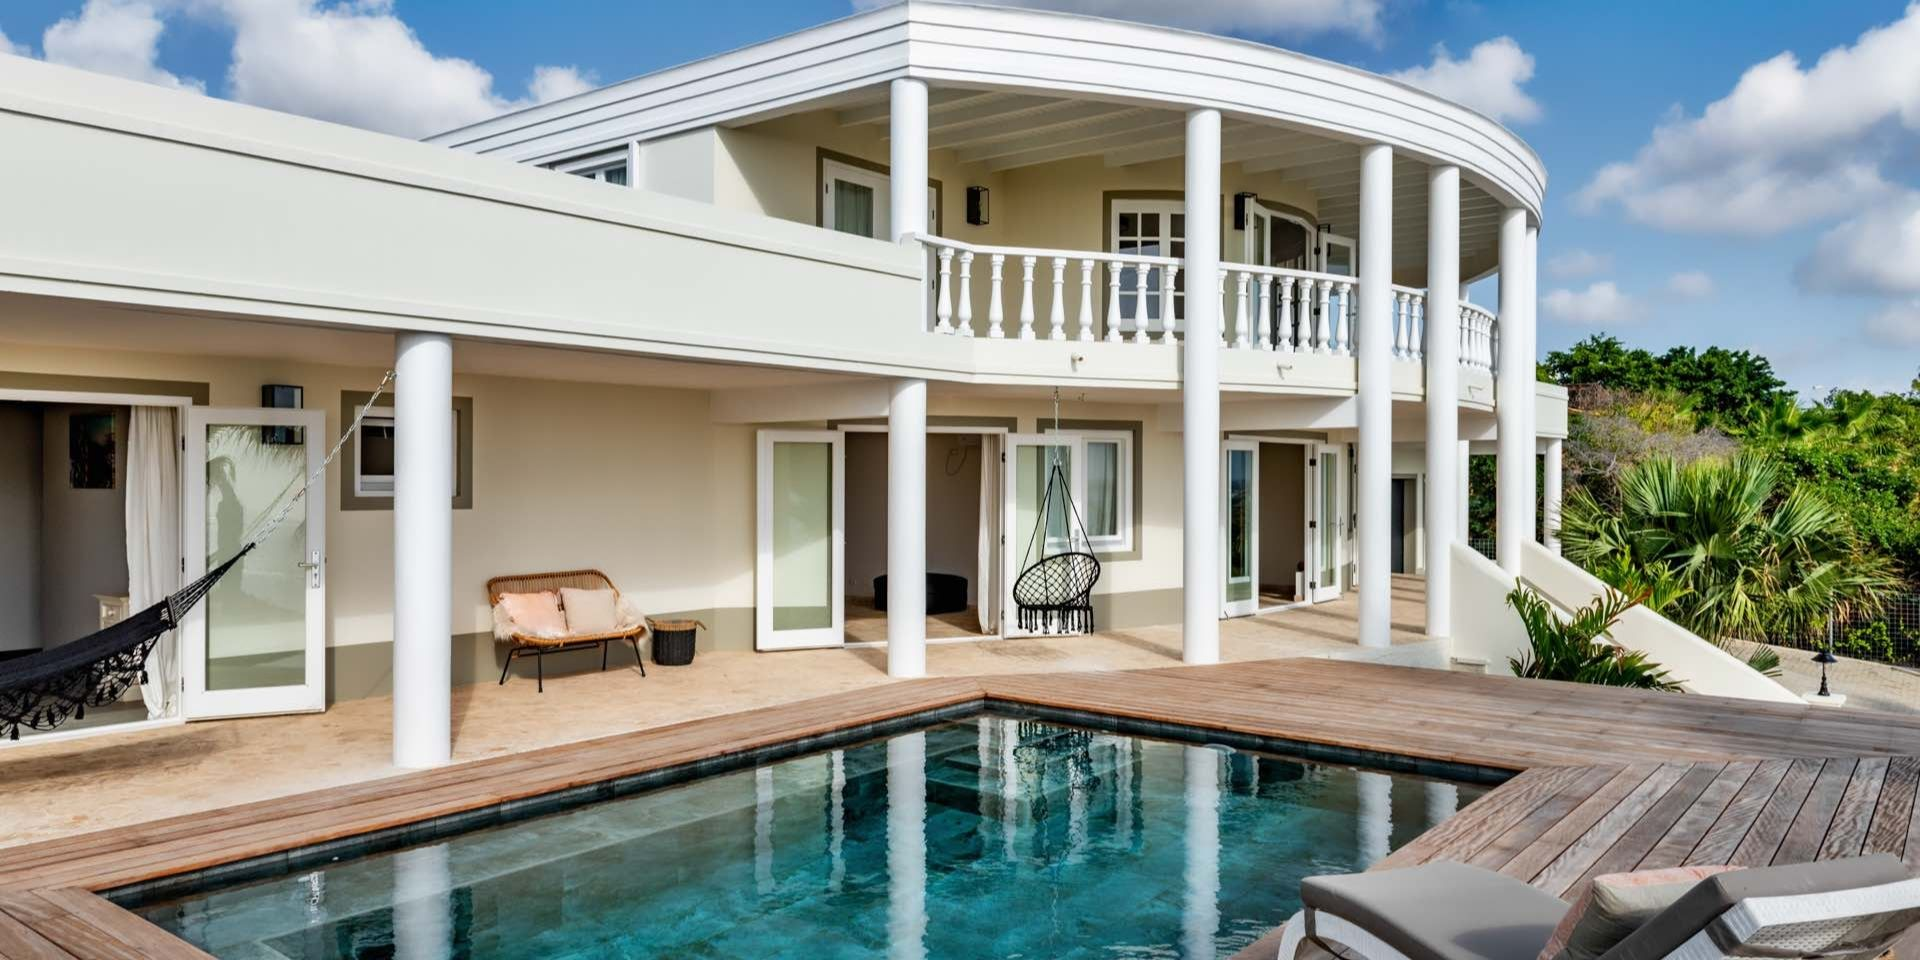 Terrace 2 - side view of ocean view villa Bonaire